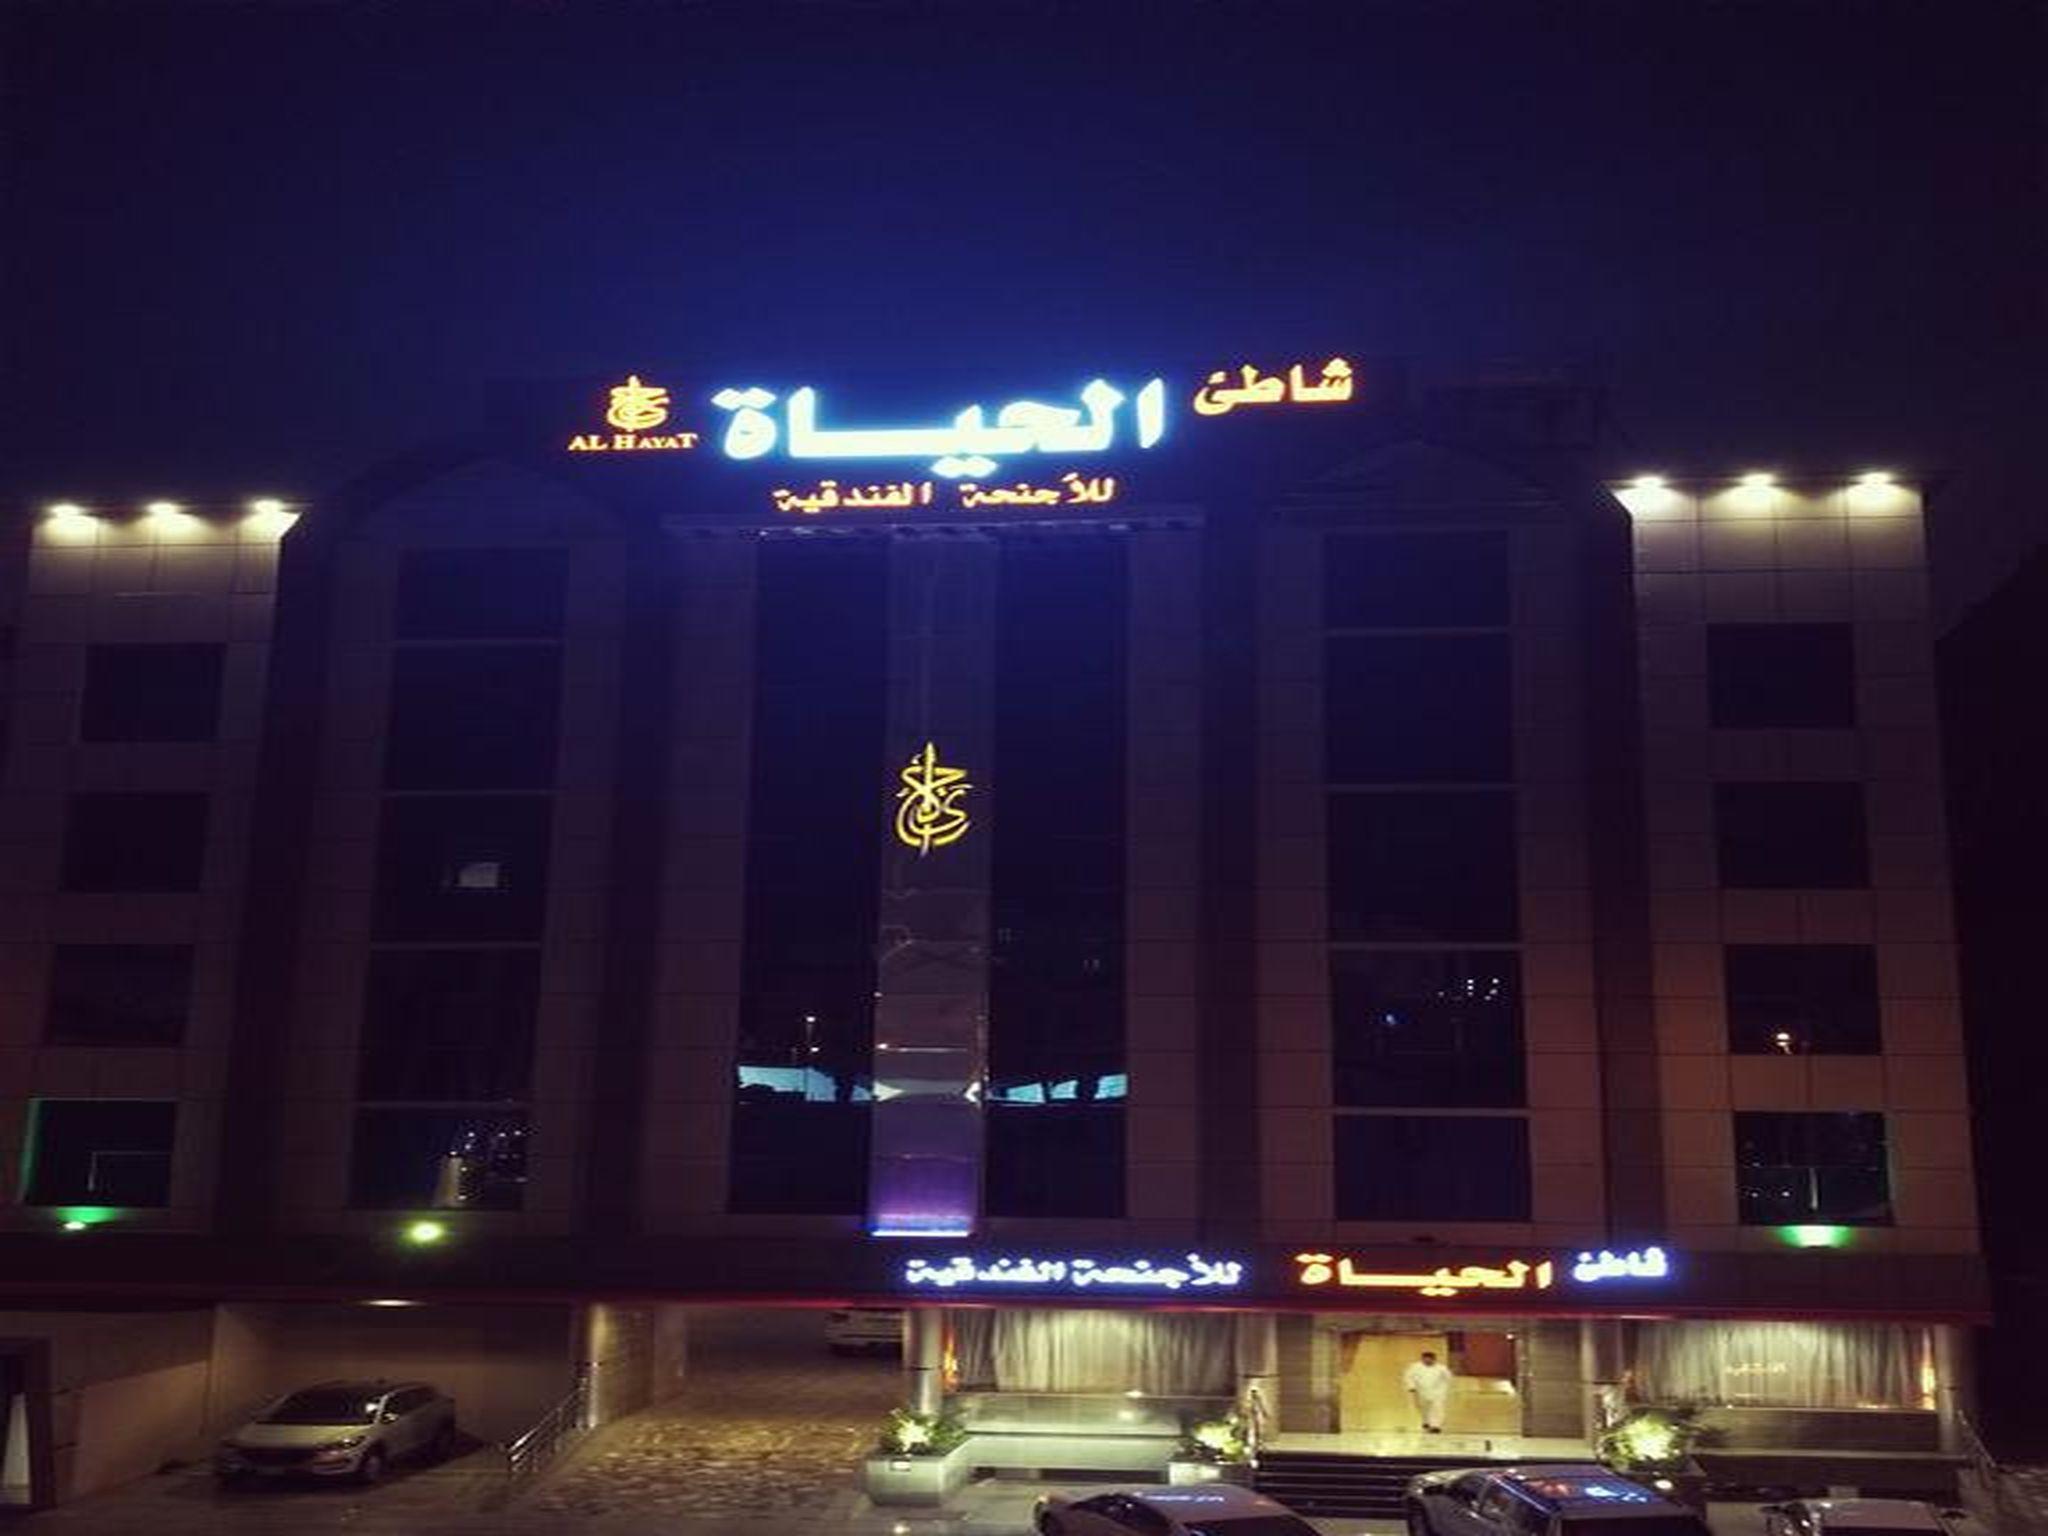 Shate Al Hayat Hotel Suites, Jeddah